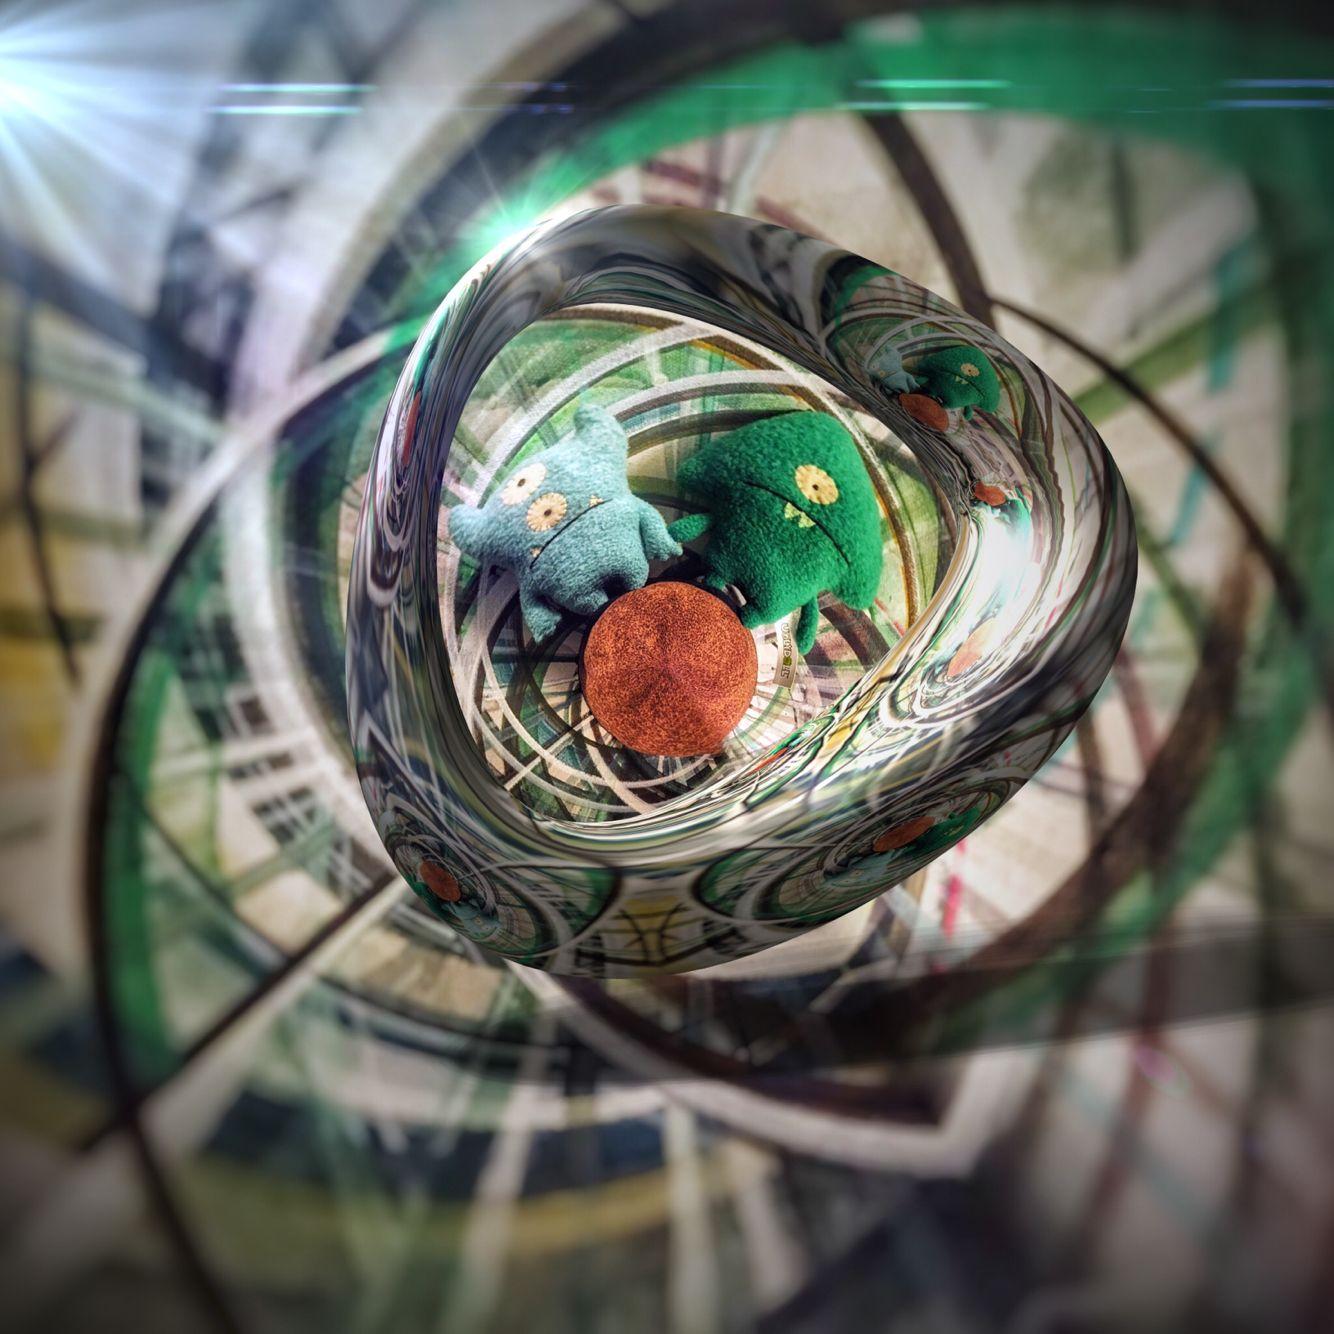 #Circular_app #LensFlare